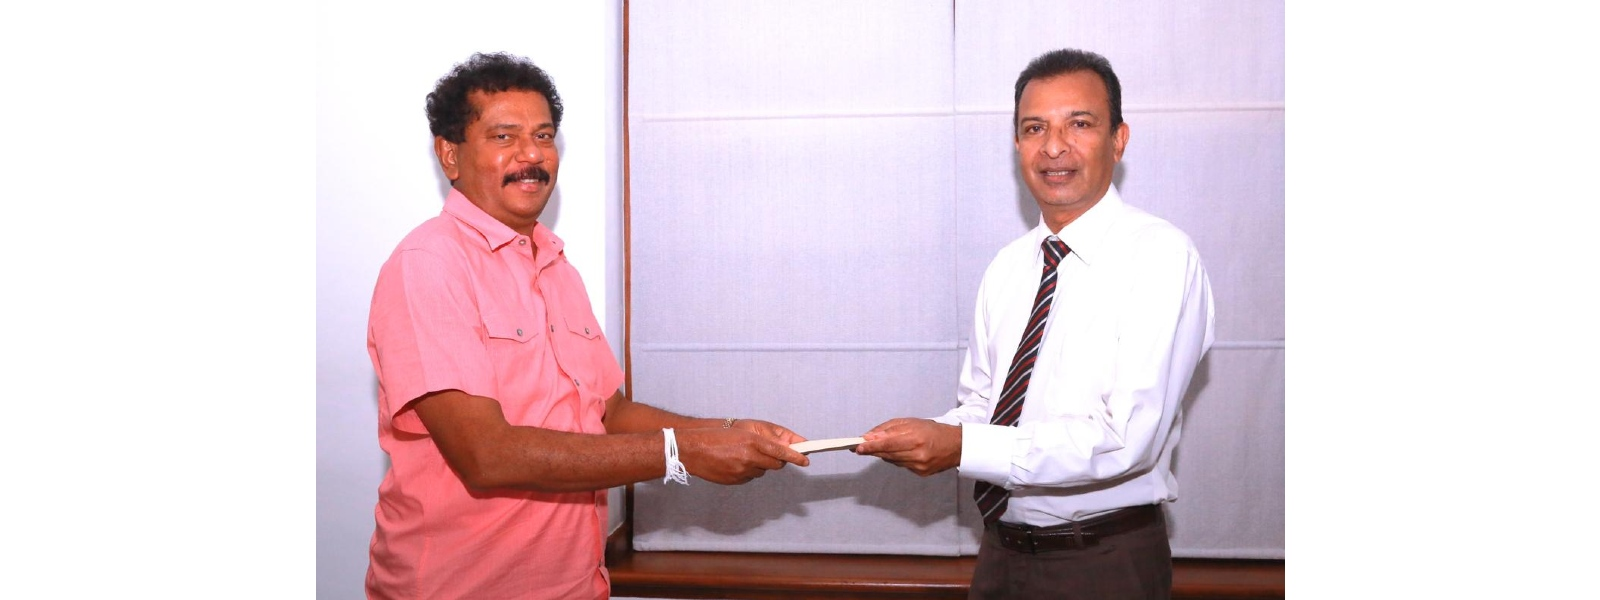 Veteran Journalist Rohan Weliwita appointed as Media Secretary to Prime Minister Mahinda Rajapaksa